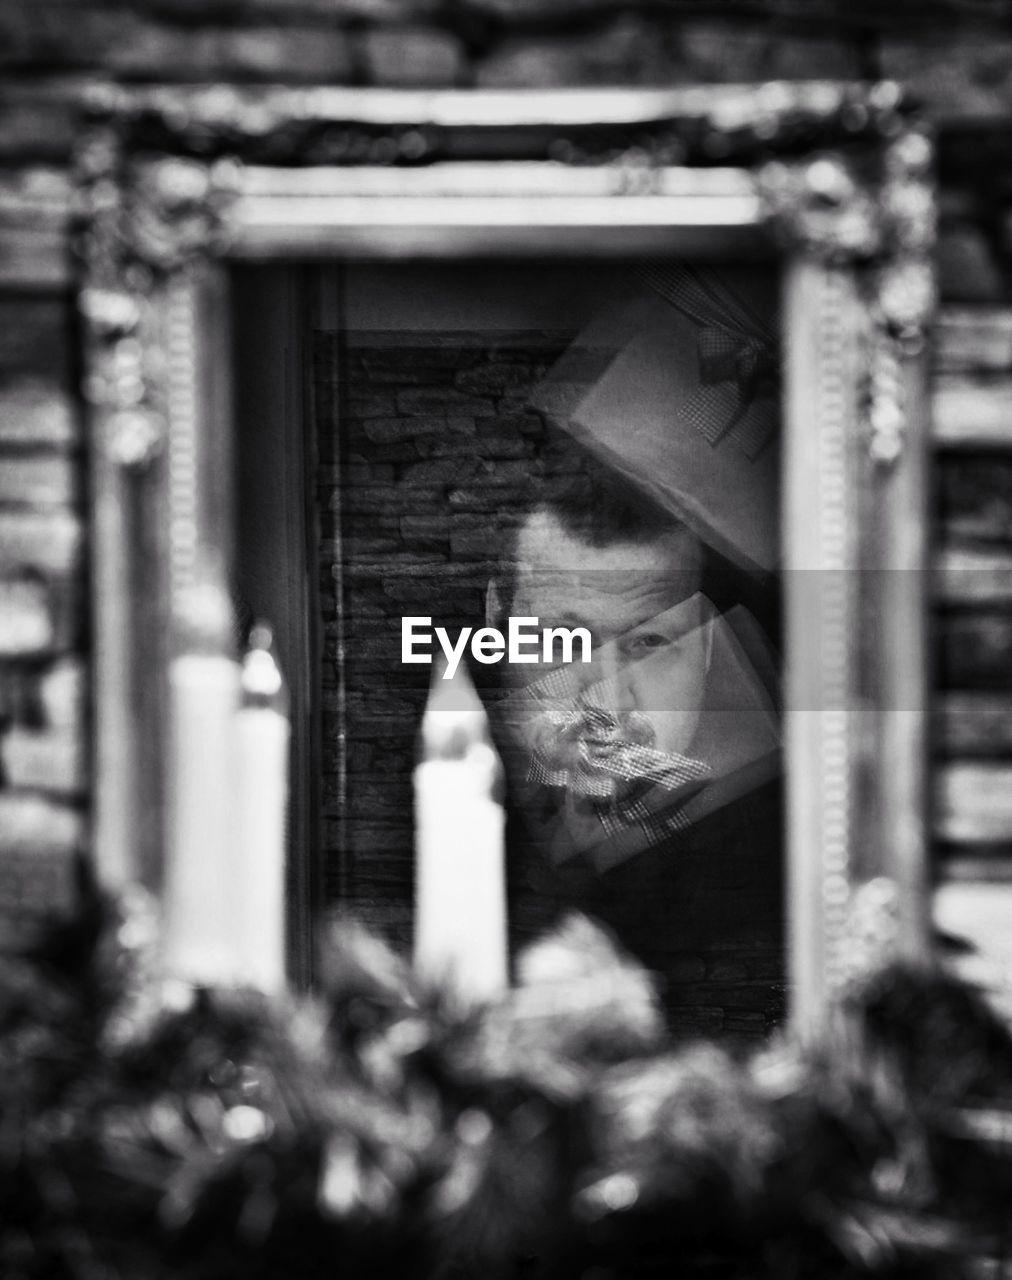 Reflection Of Man Seen On Glass Window